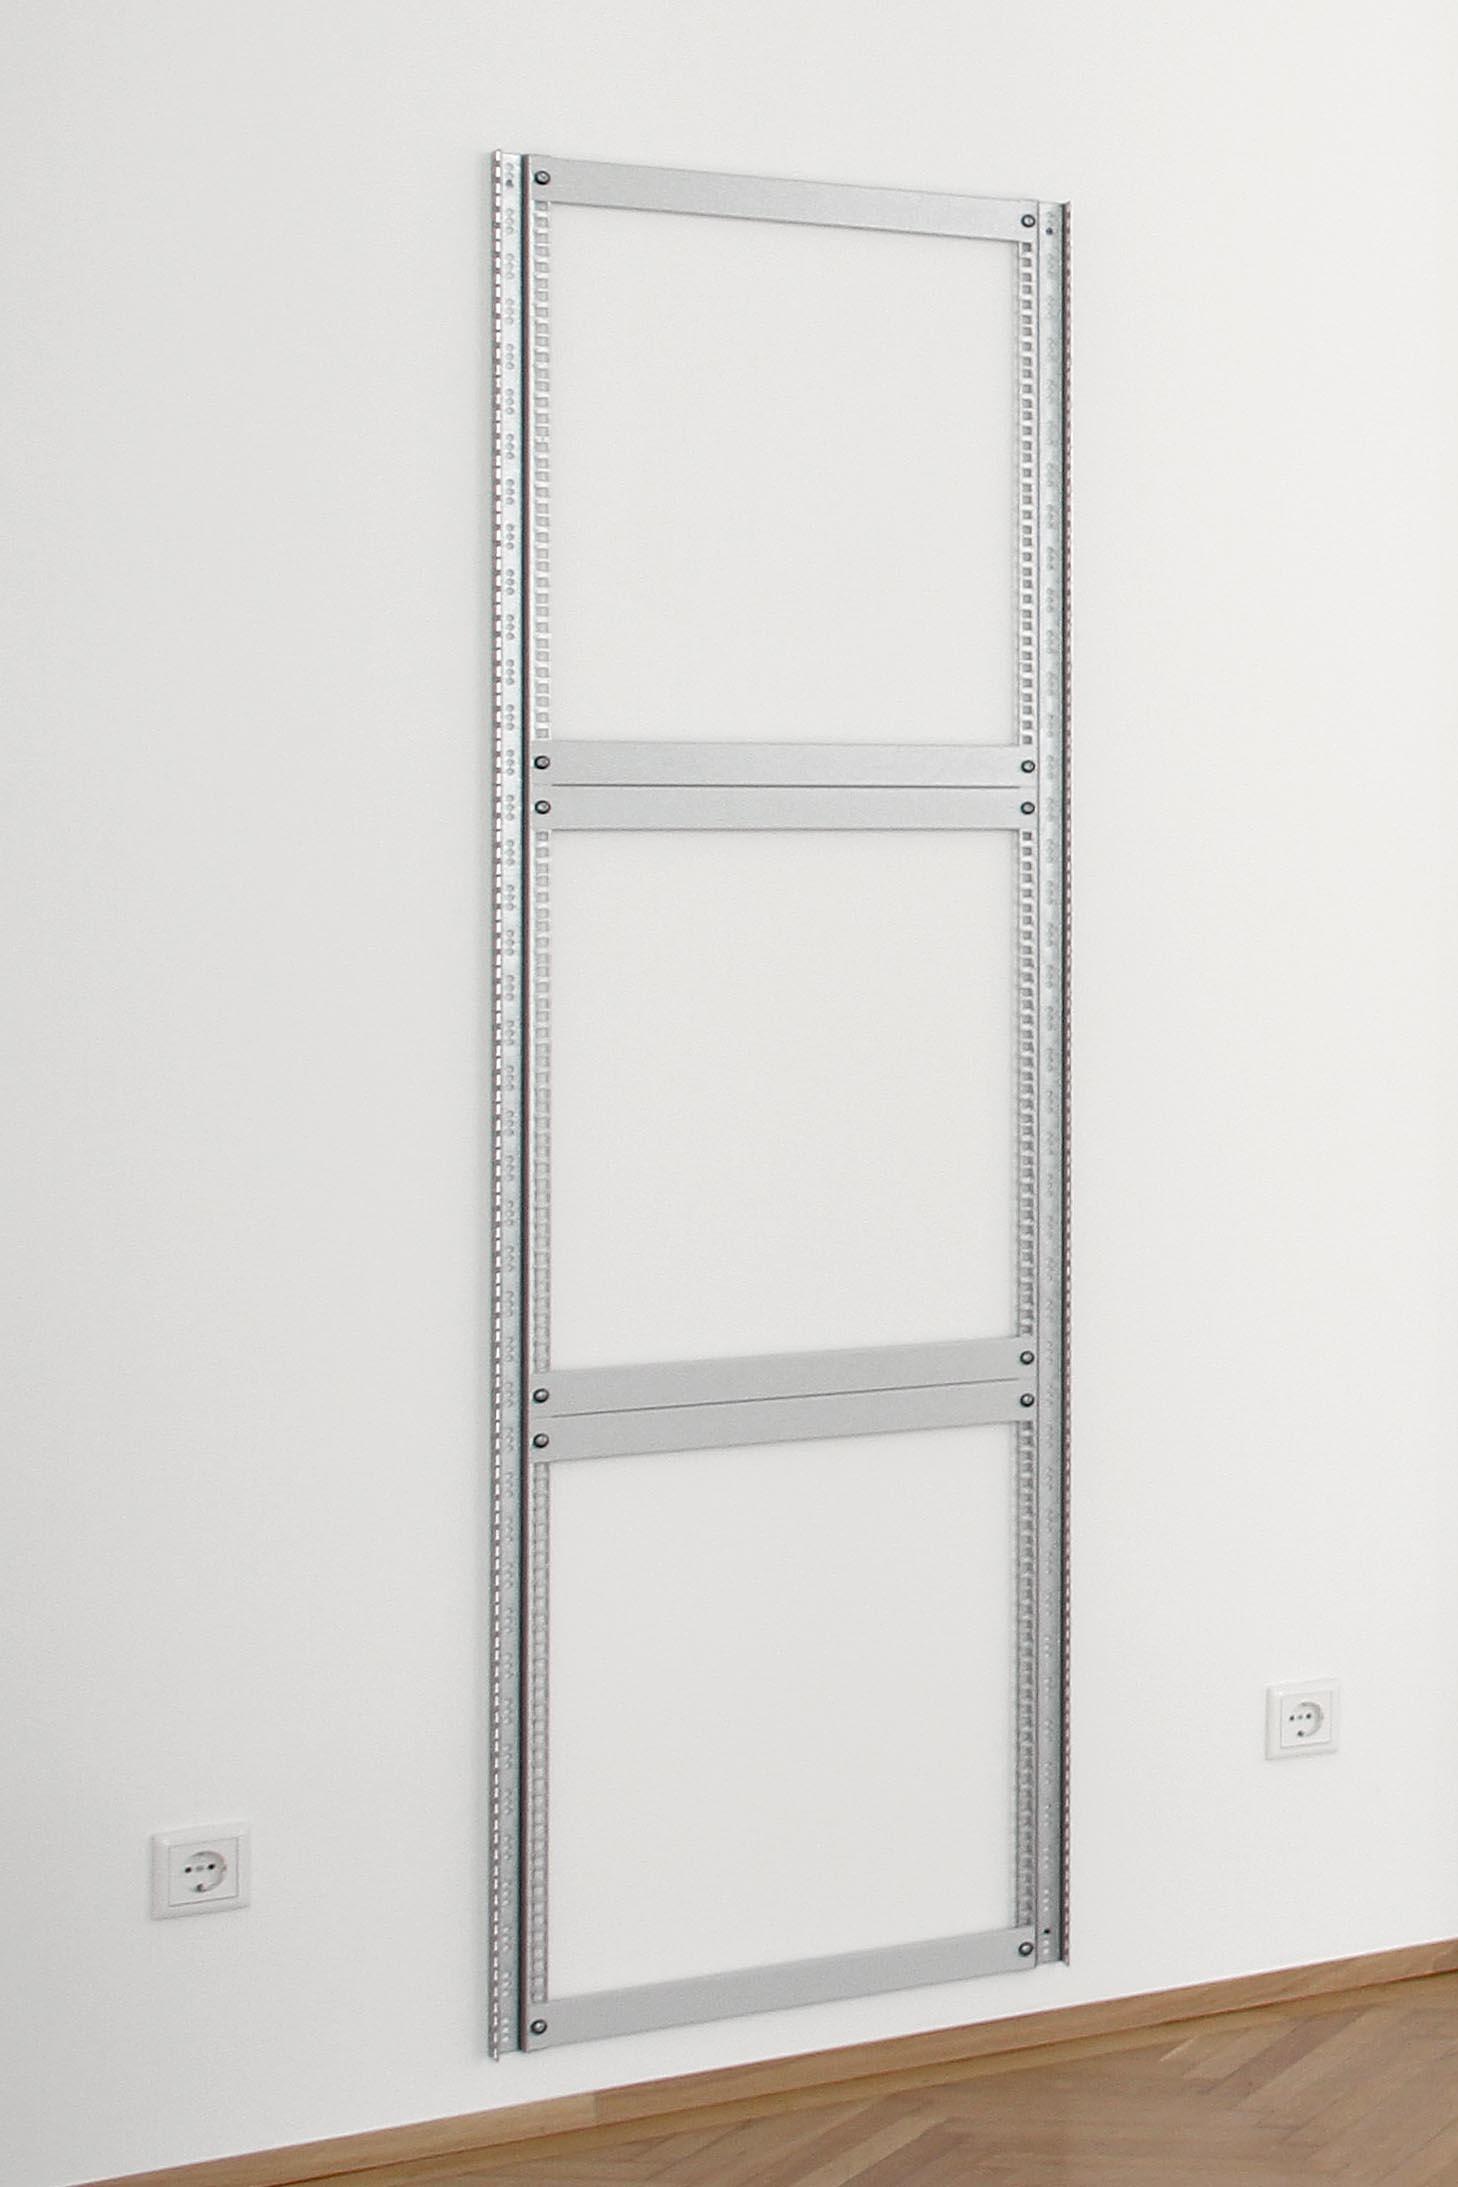 Ulrich Nausner, Memory Object (Grey) #4, 2017,  server rack rails, blank panels, screws , 186,5 x 54,5 x 3,2 cm, 1 + 1AP